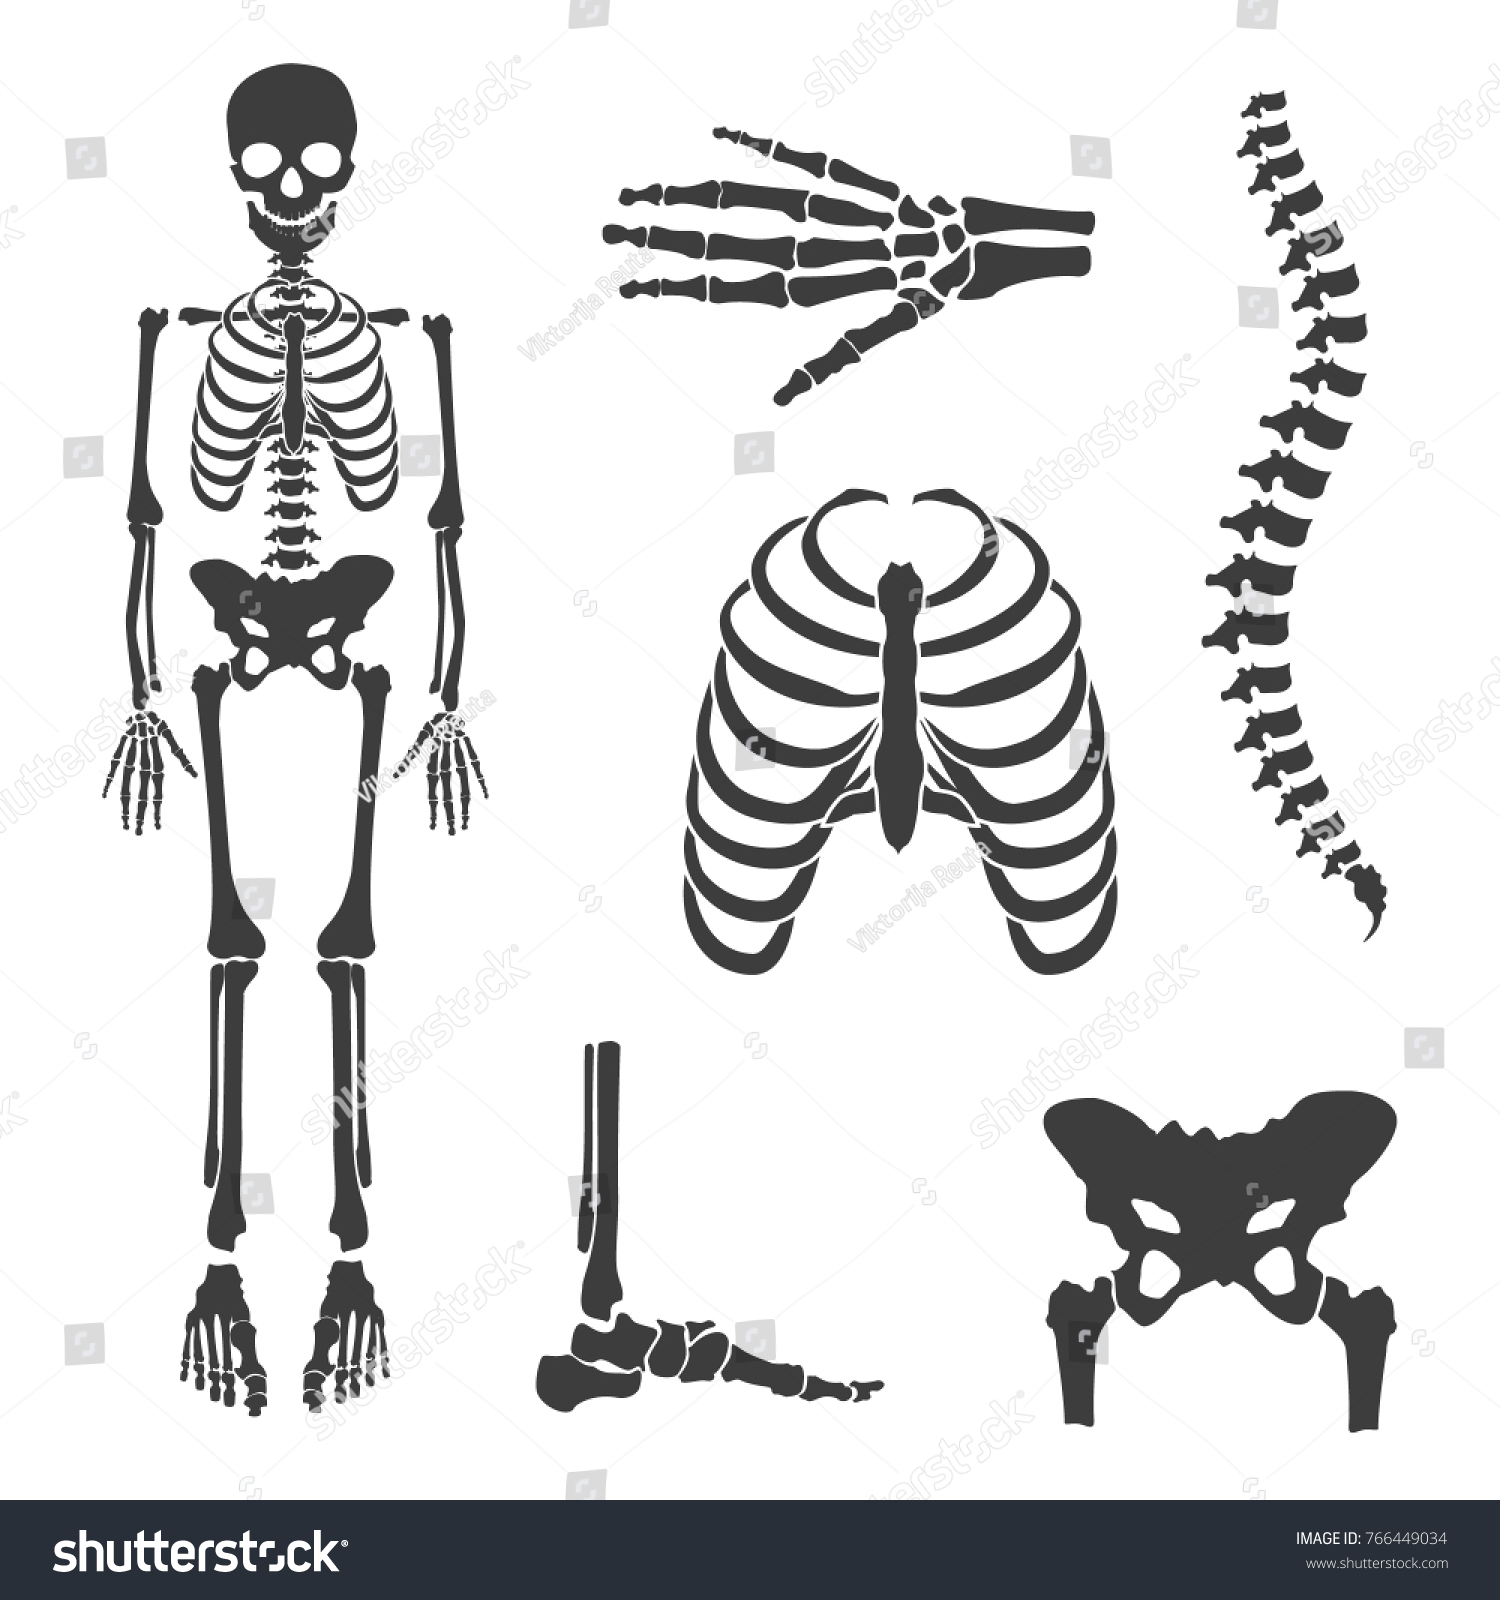 Vector Illustration Parts Human Skeleton Human Stock Vektorgrafik